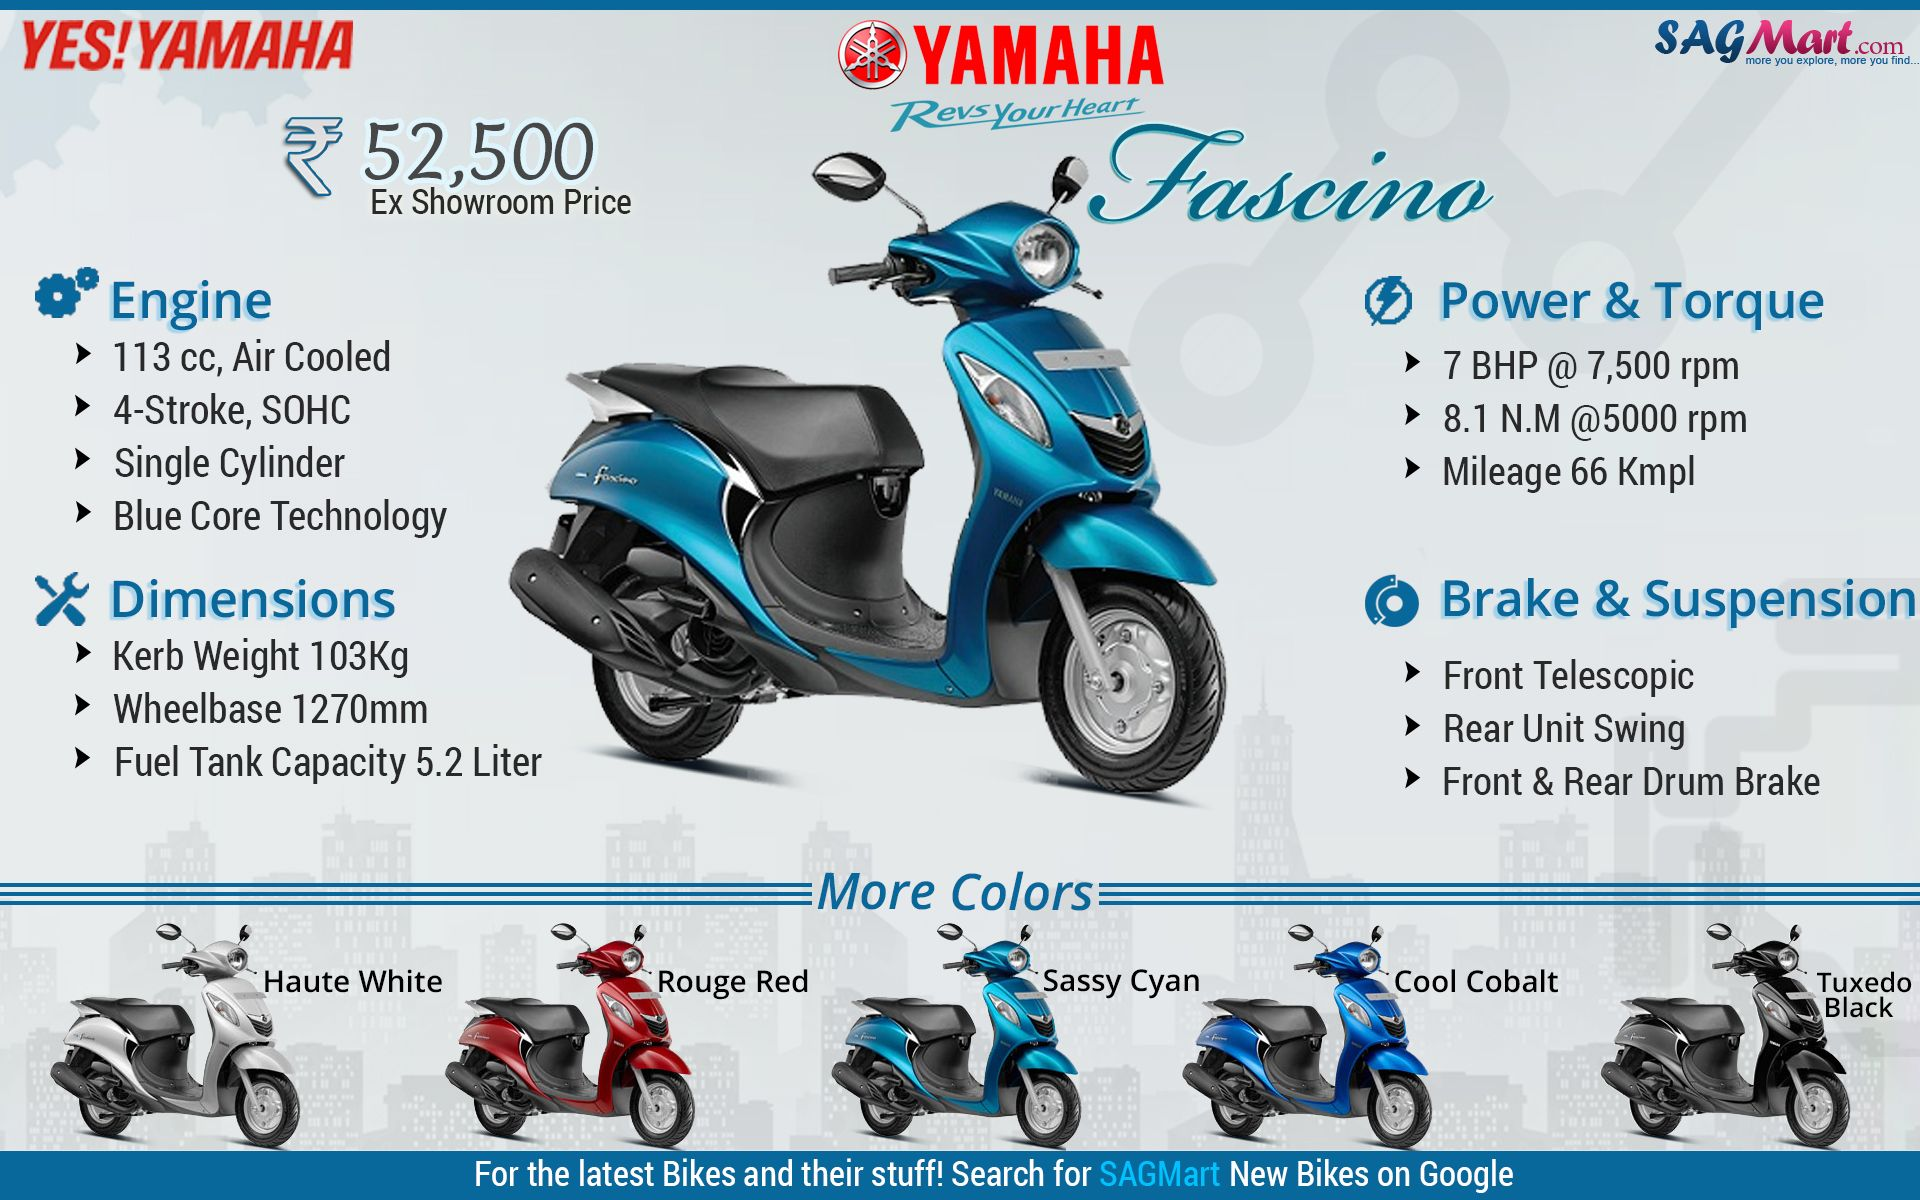 Yamaha Fascino Scooter Infographic Yamaha Car Showroom Infographic